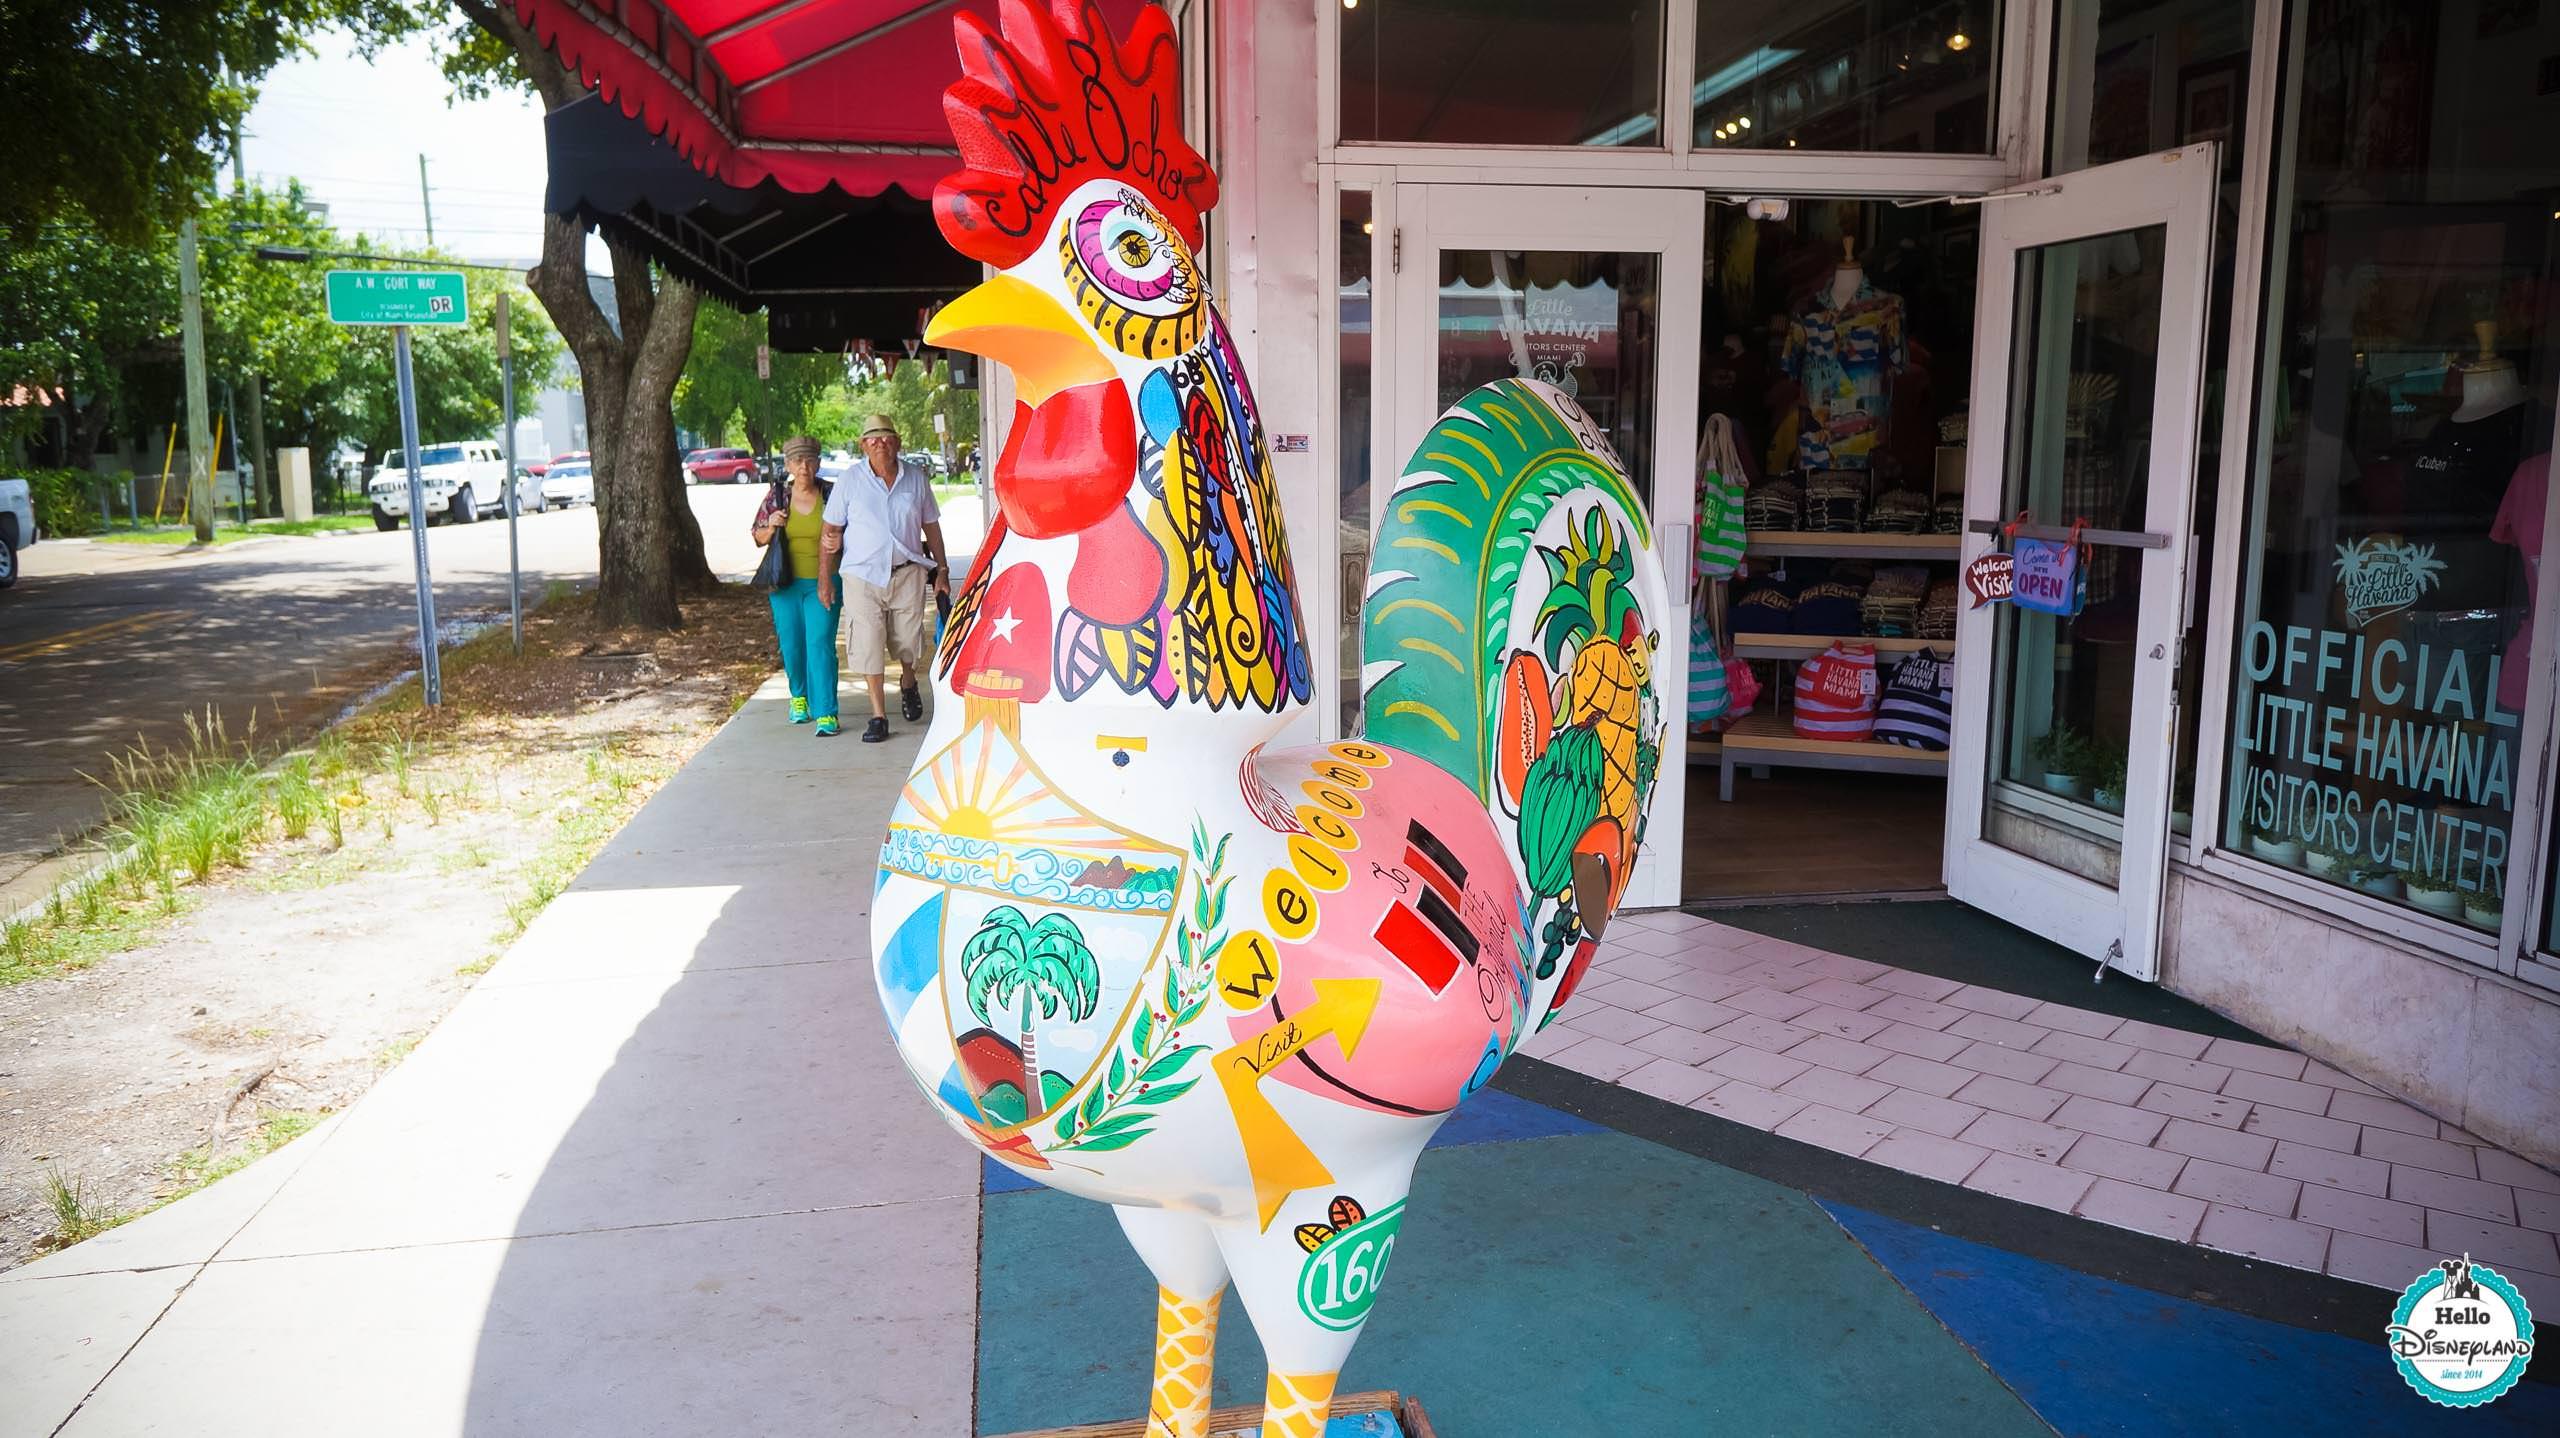 Floride Miami - Walt Disney World